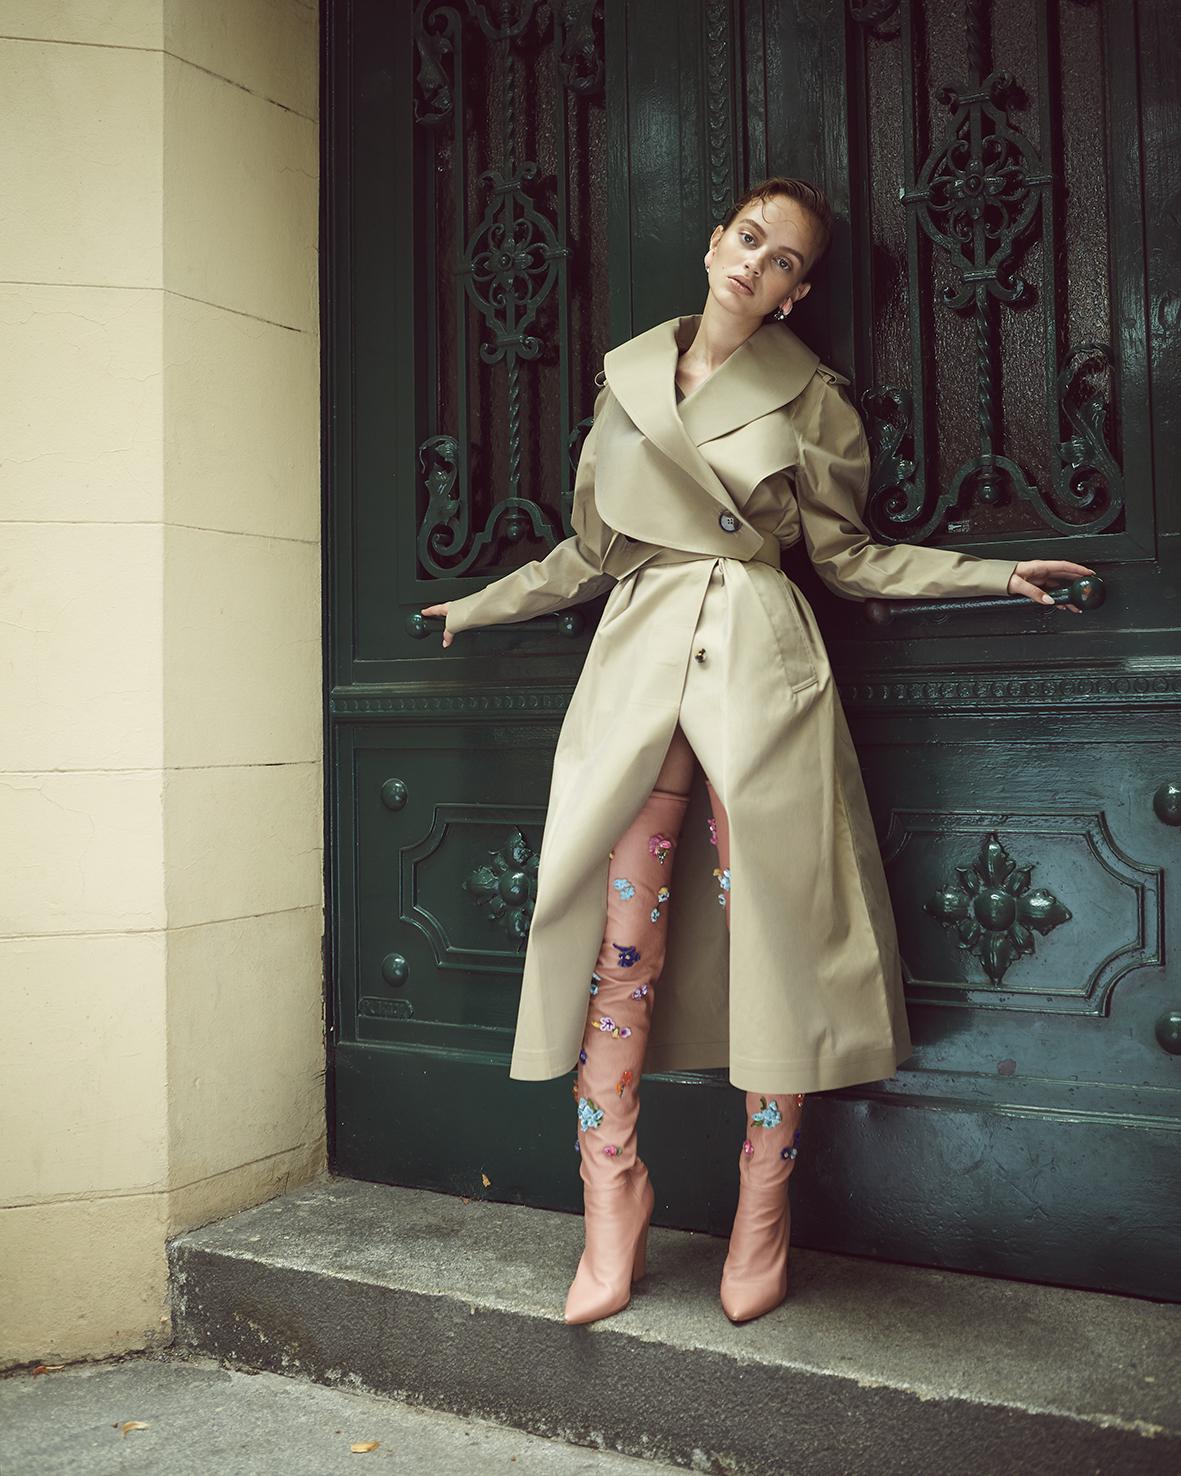 Female fashion editorial with model Krista Tcherneva from ICONIC by Heidi Rondak